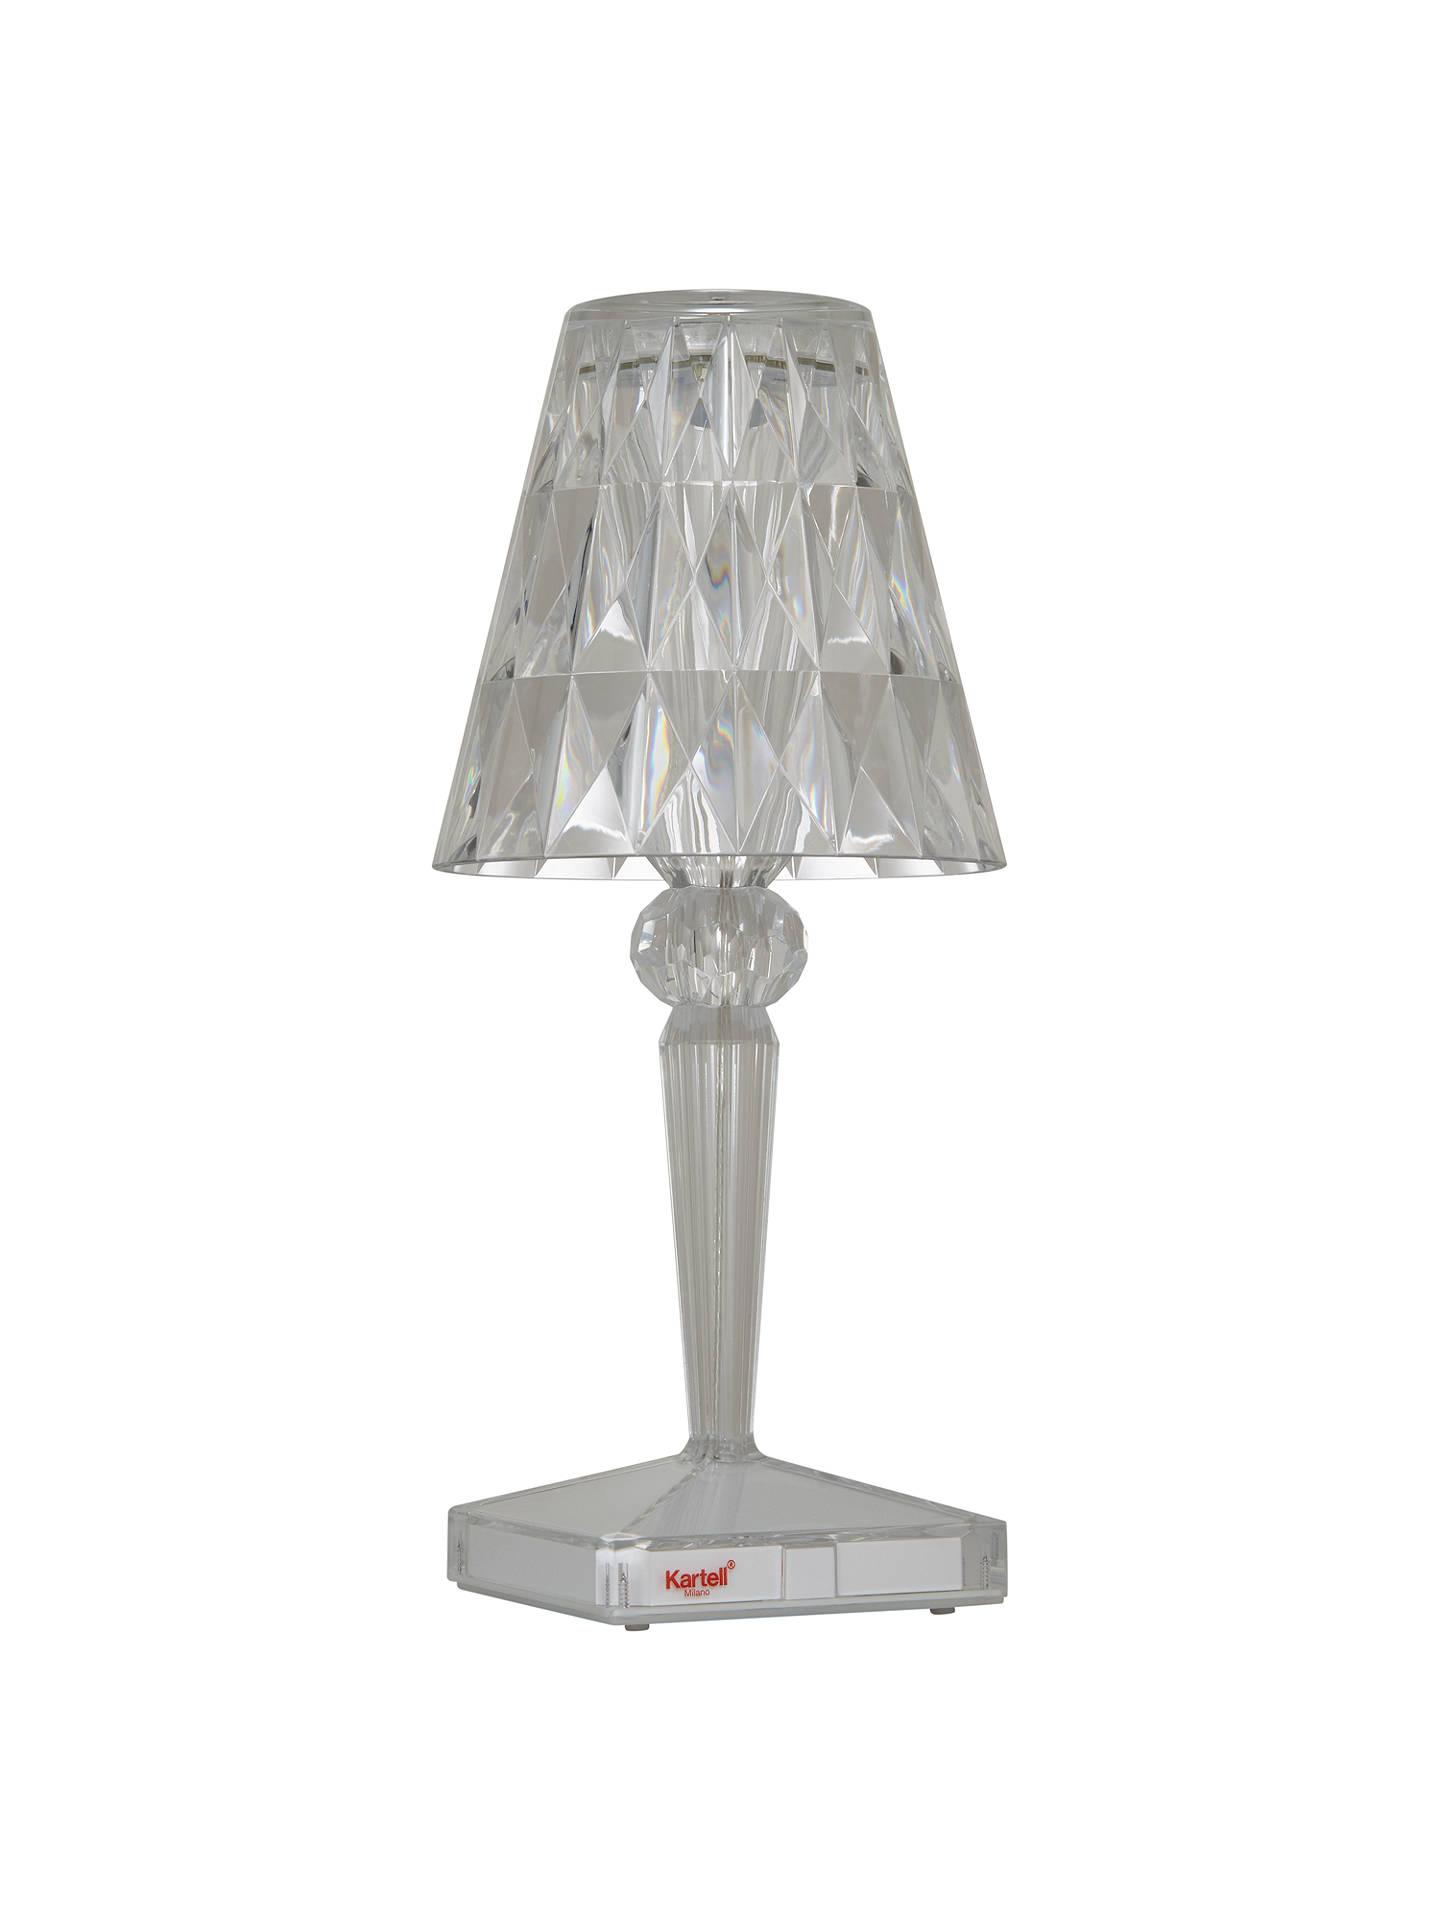 Kartell Battery Table Lamp At John Lewis Amp Partners